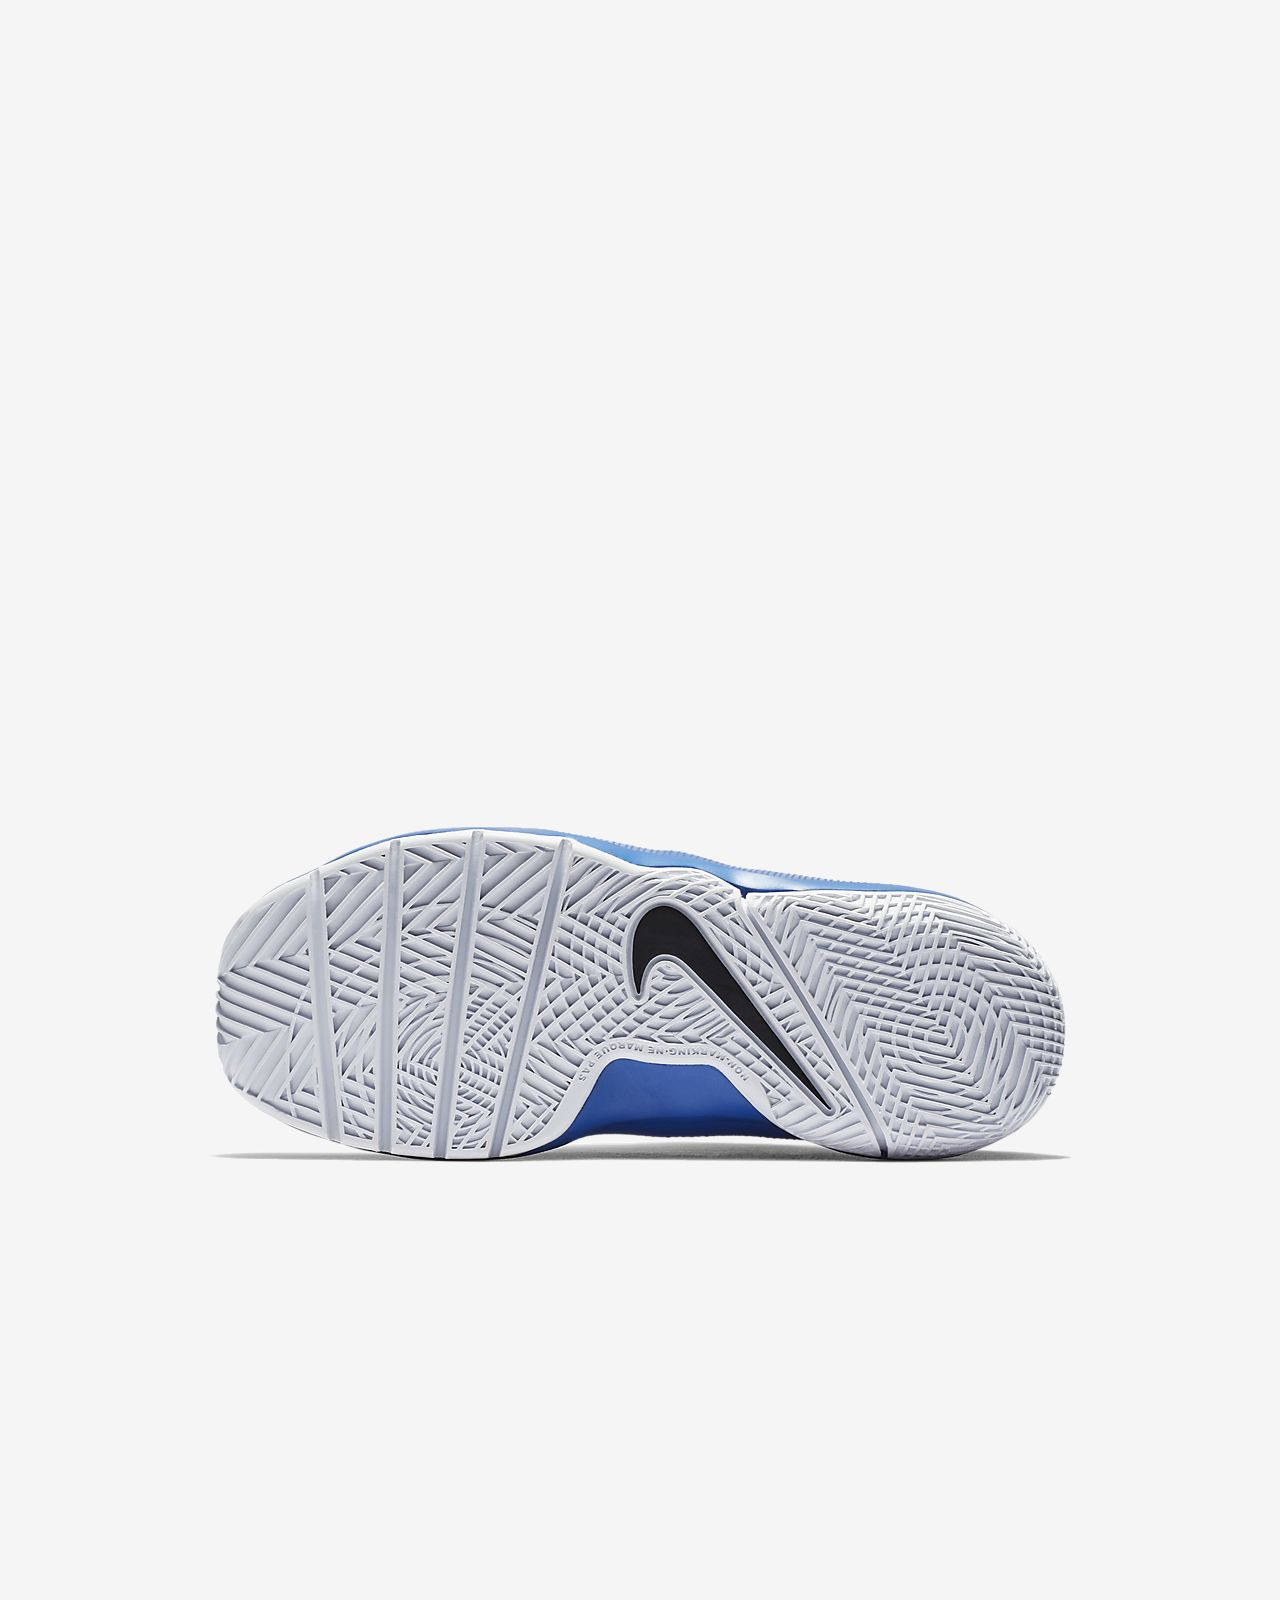 timeless design f1898 e6625 ... Nike Team Hustle Quick Little Kids  Shoe